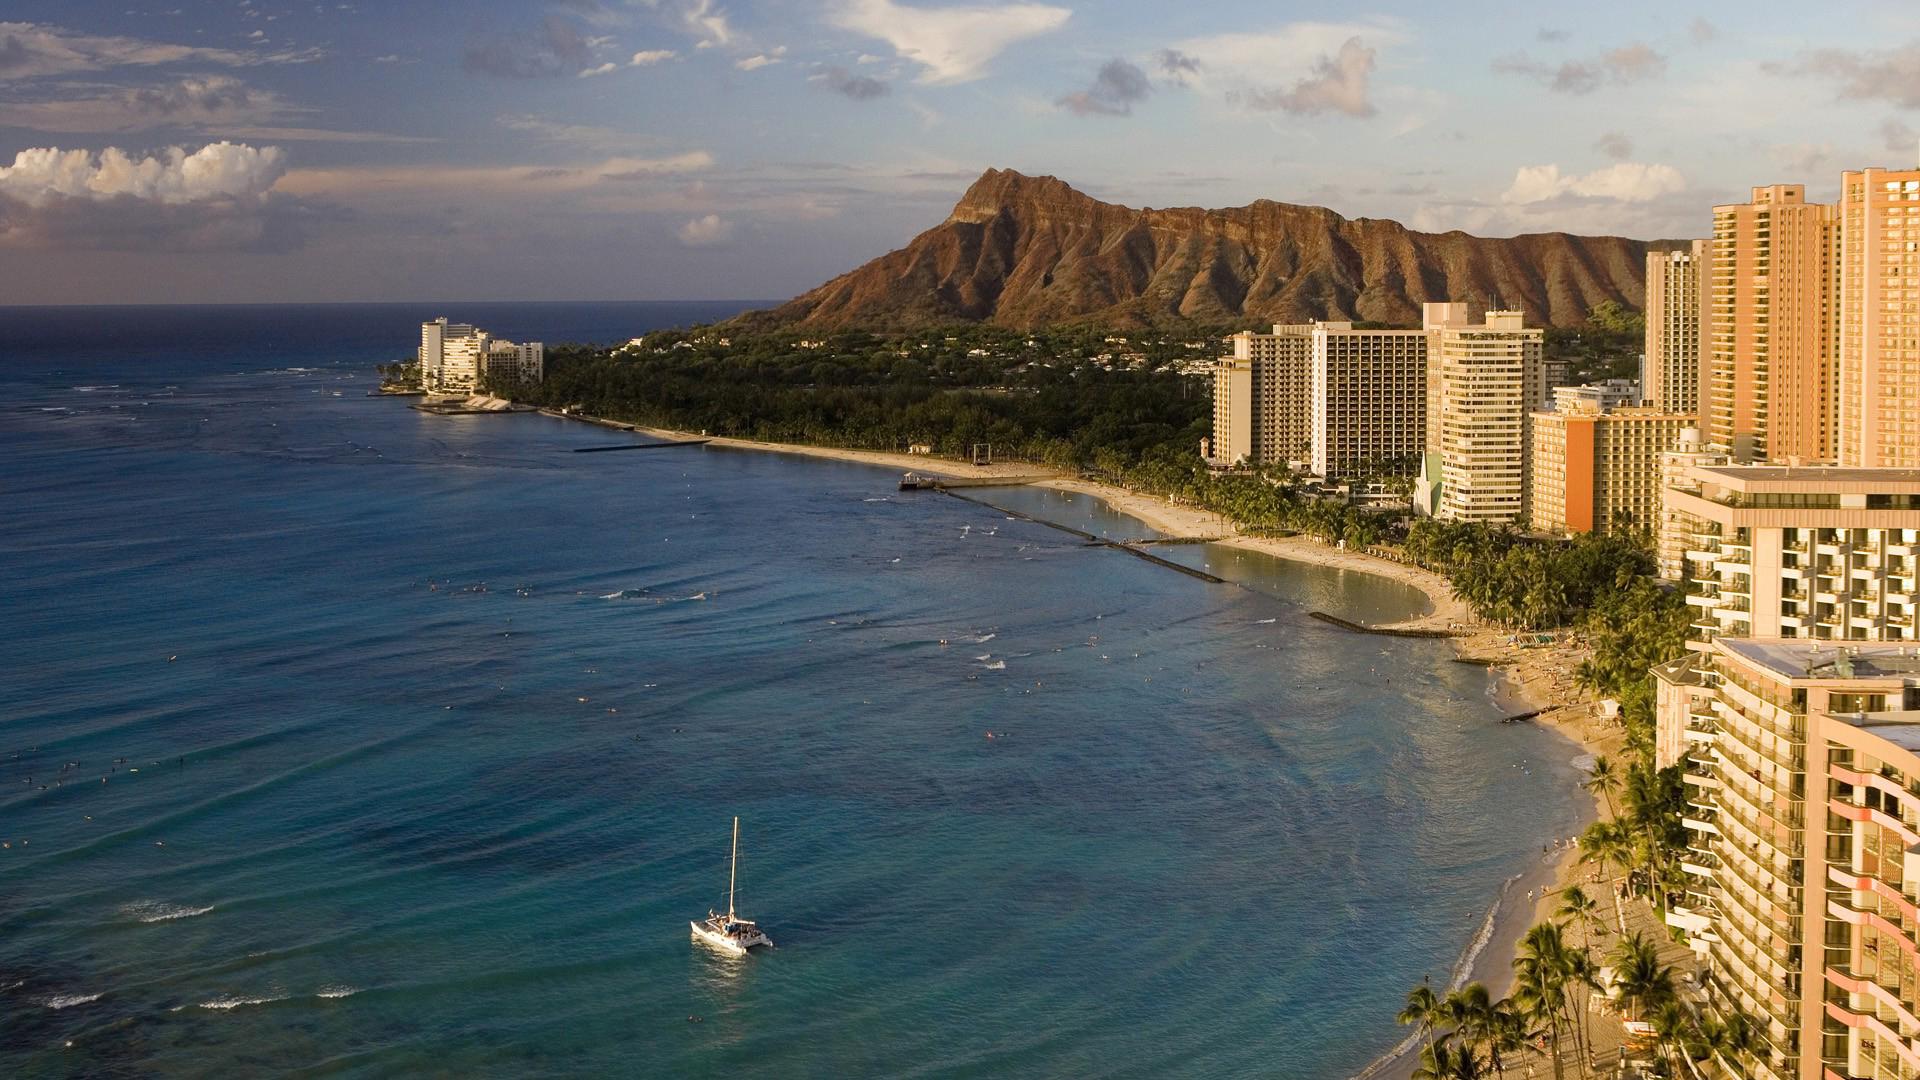 Waikiki Beach Honolulu Oahu, Hawaii Fond d'écran HD   Arrière-Plan   1920x1080   ID:360408 ...